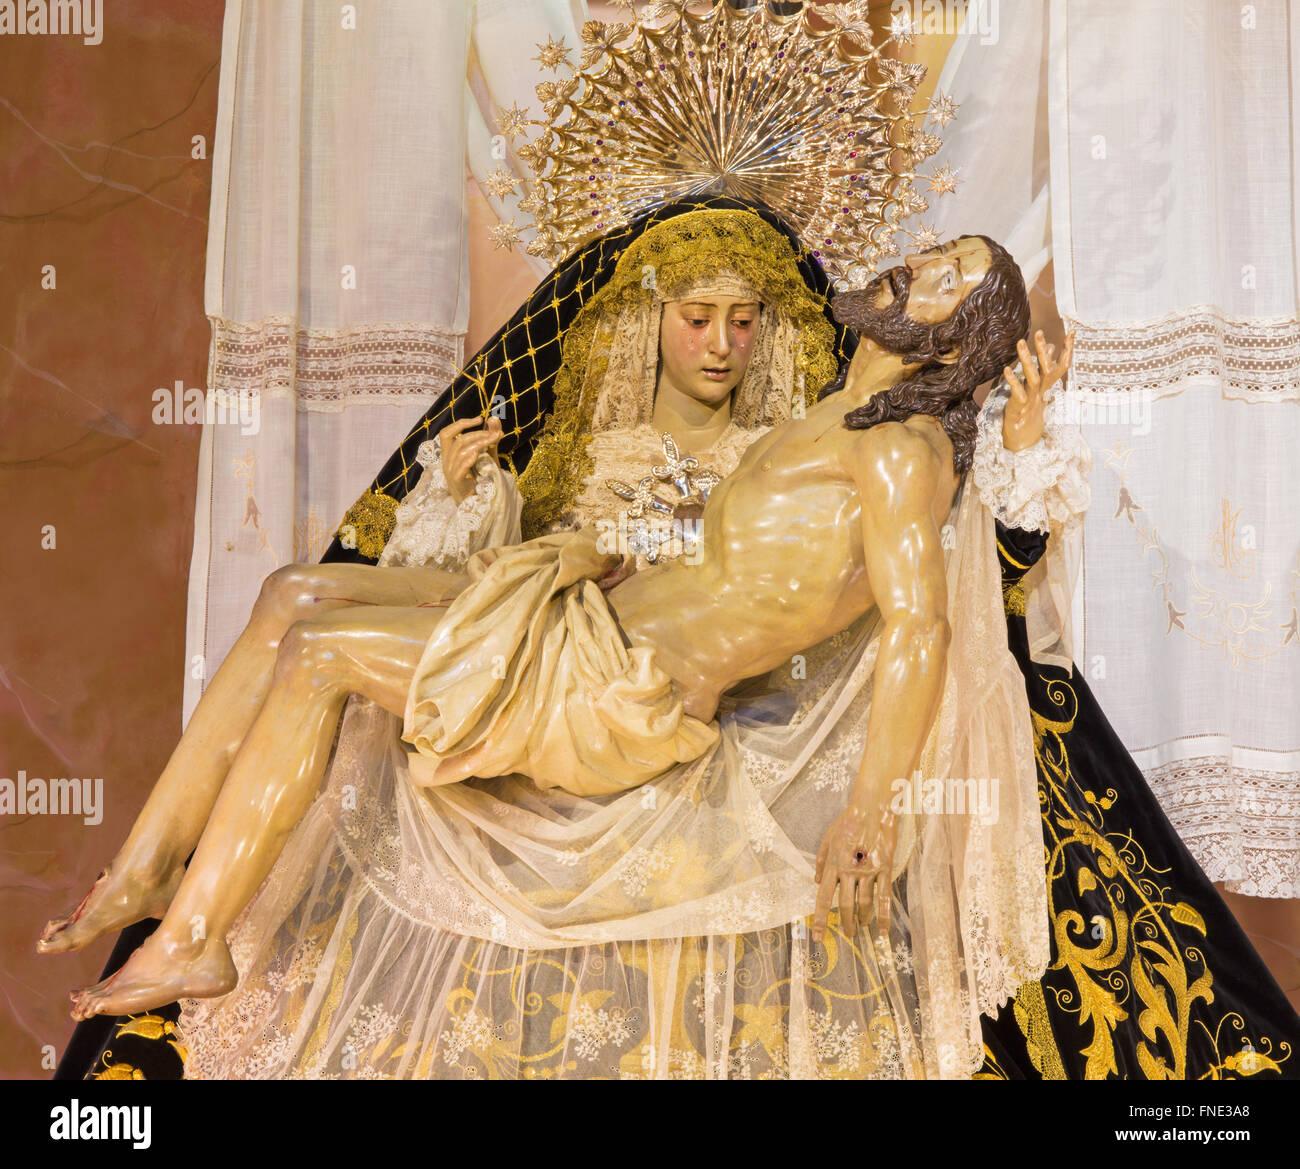 CORDOBA, SPAIN - MAY 26, 2015: The traditional vested Lady of Sorrow statue (Pieta) in church Iglesia de San Augustin, Stock Photo